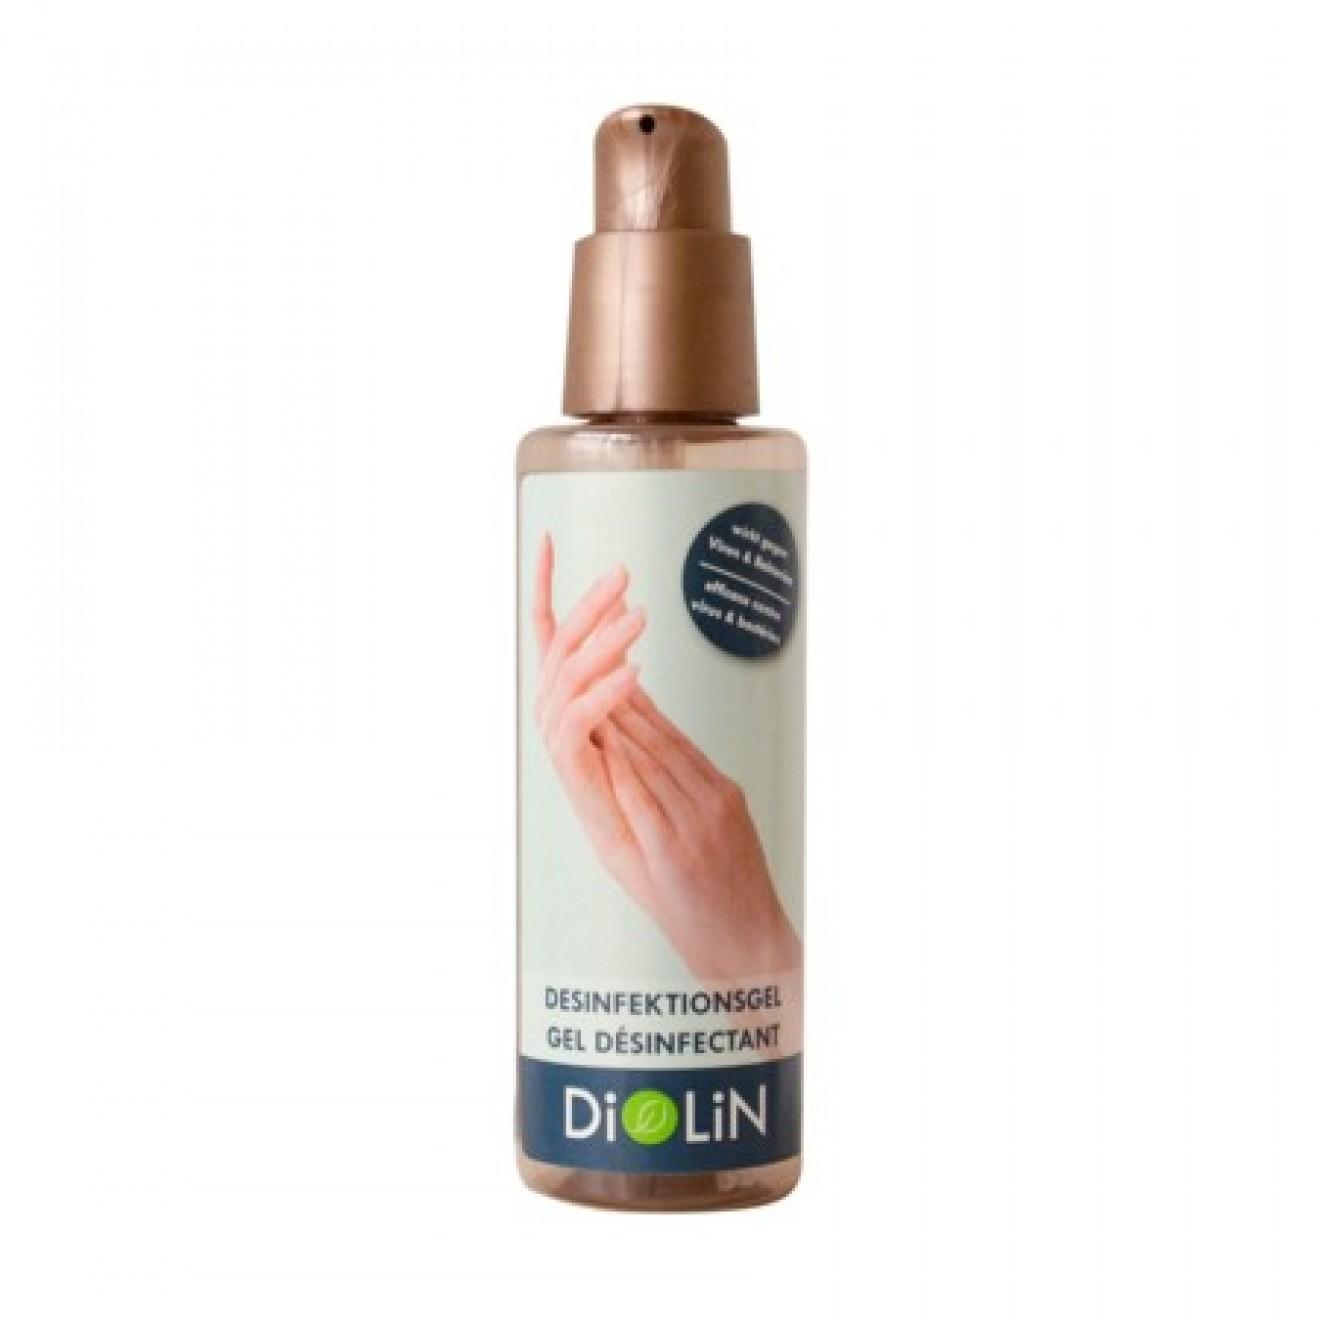 Image of Hand-Desinfektionsgel Neutral